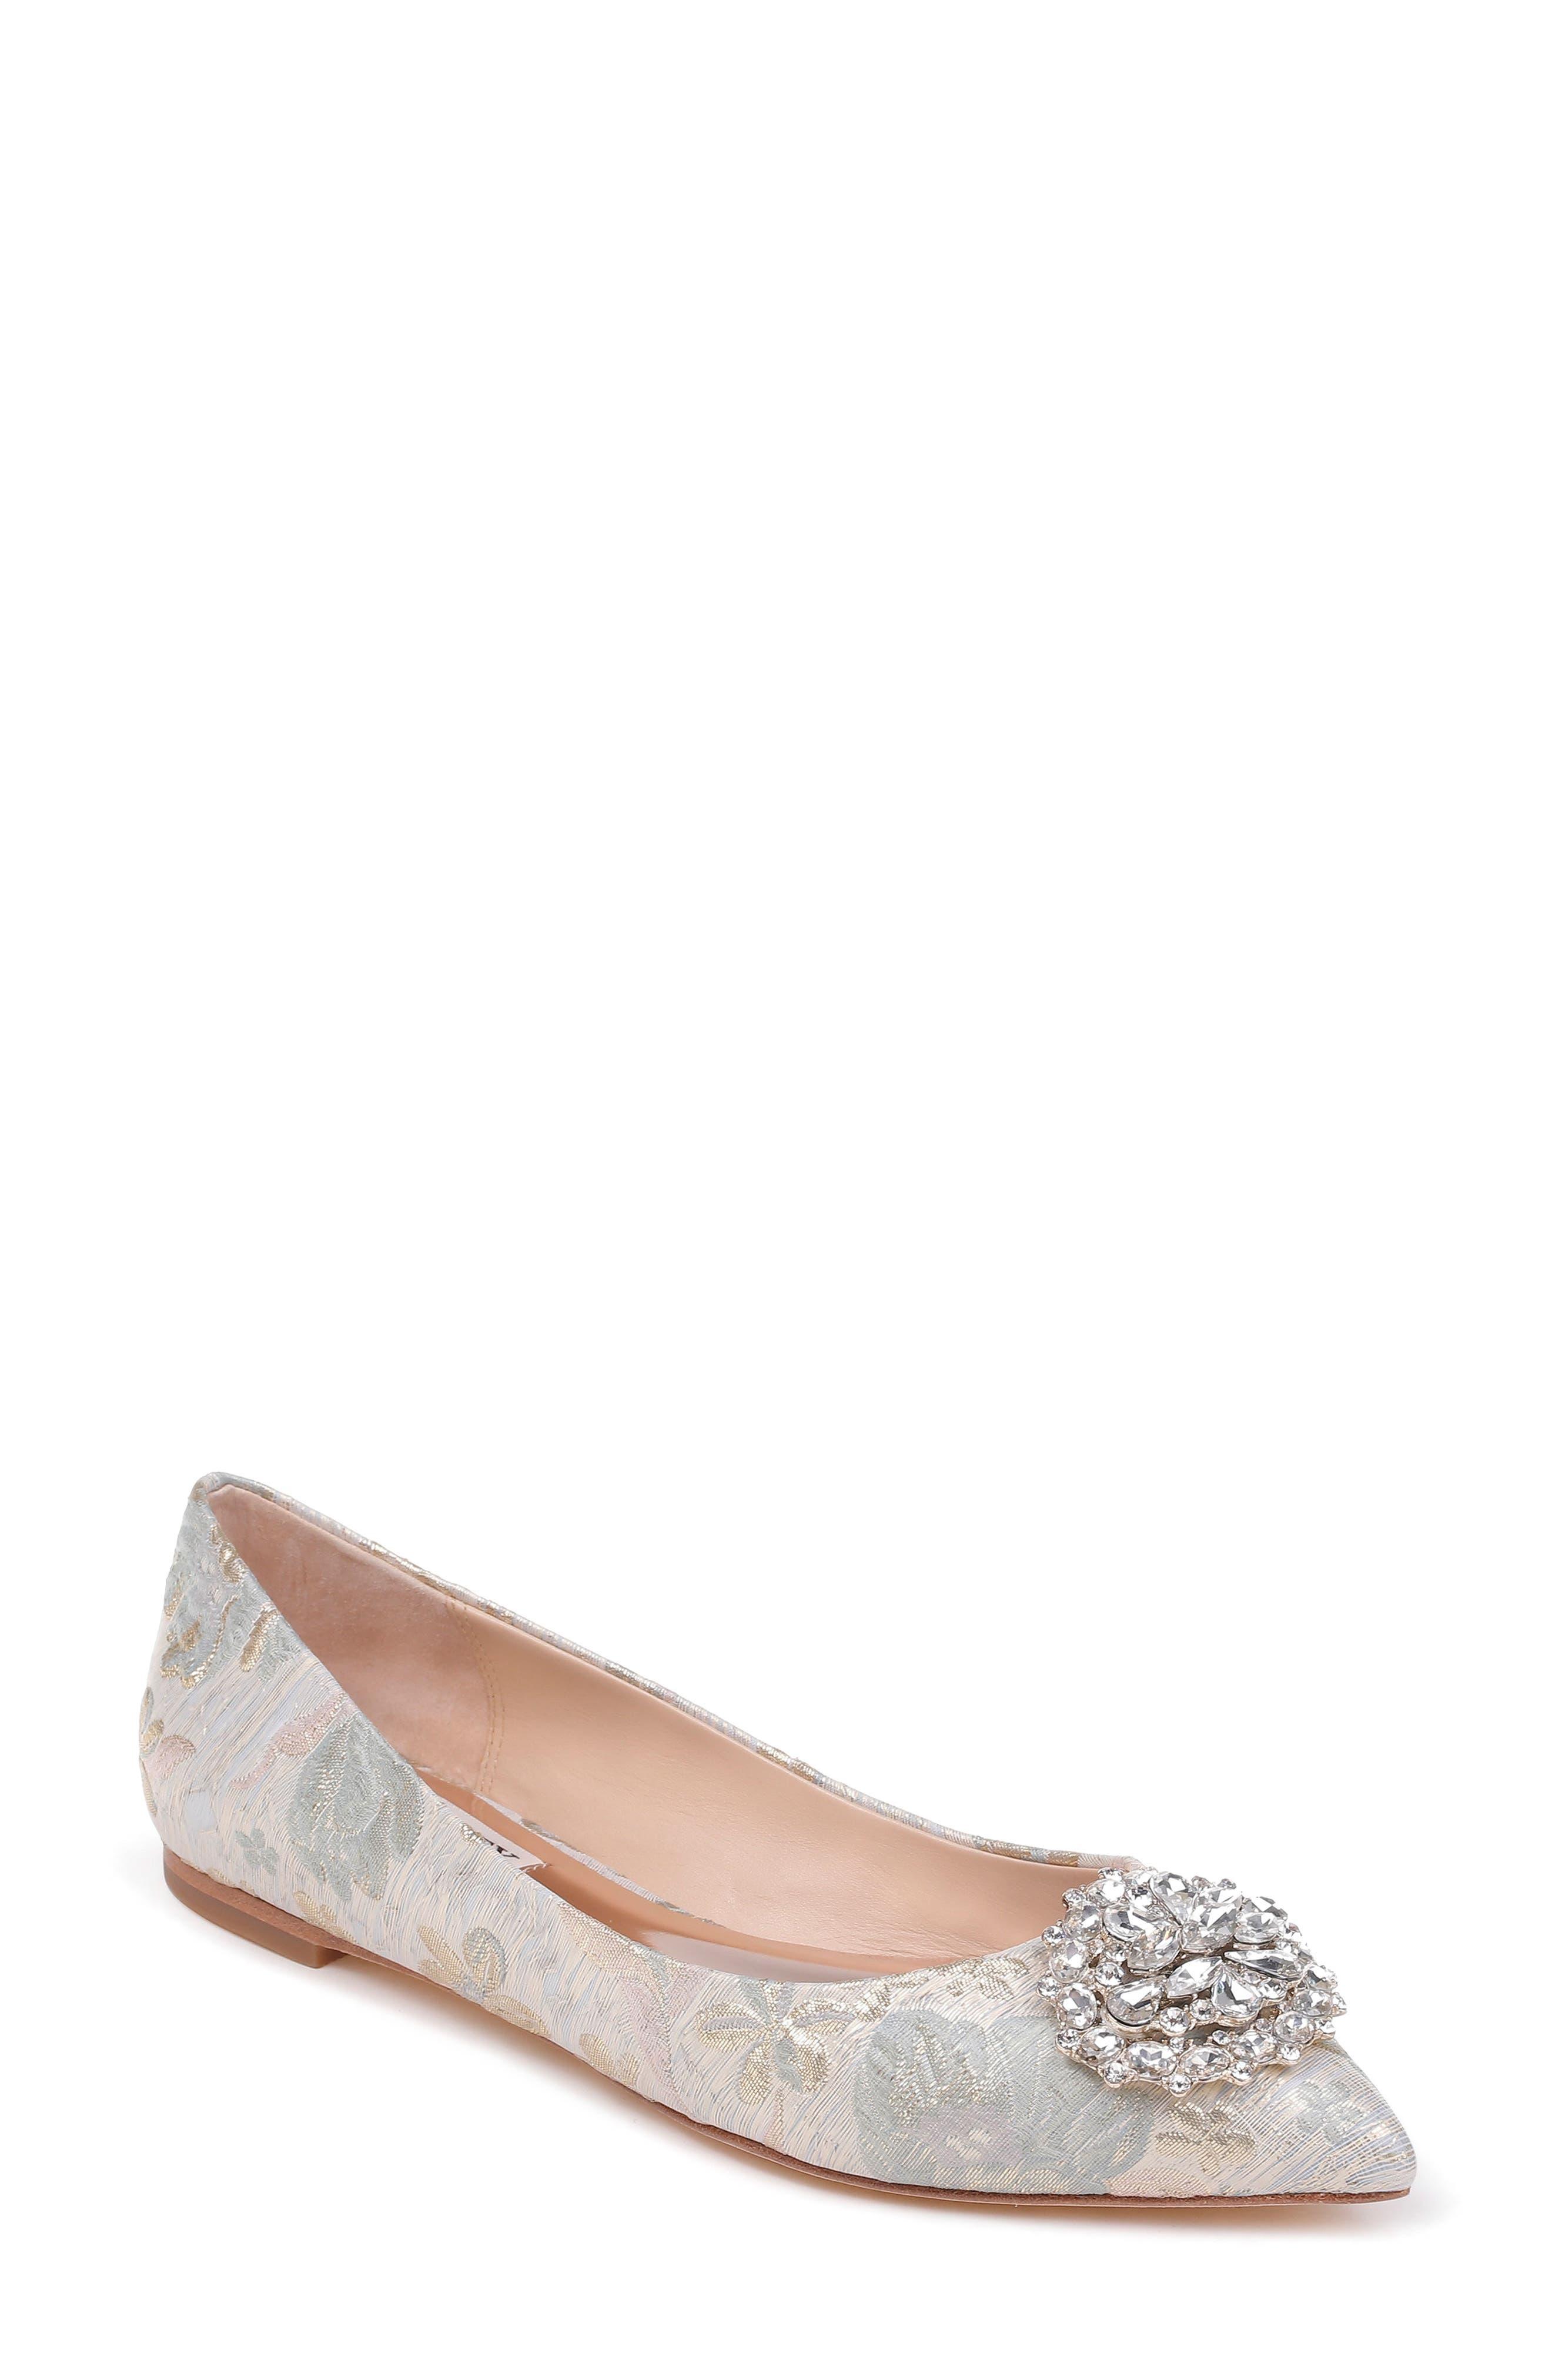 'Davis' Crystal Embellished Pointy Toe Flat,                         Main,                         color, Platino Brocade Fabric